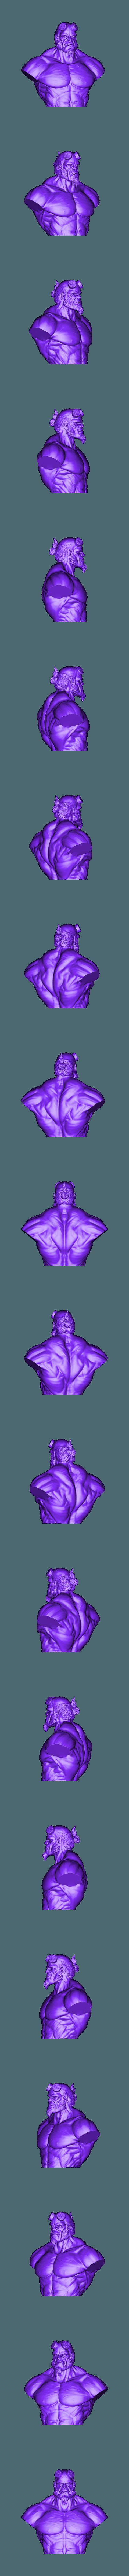 Hellboyhead.stl Download STL file HELLBOY 2019 • 3D printable model, Bstar3Dart